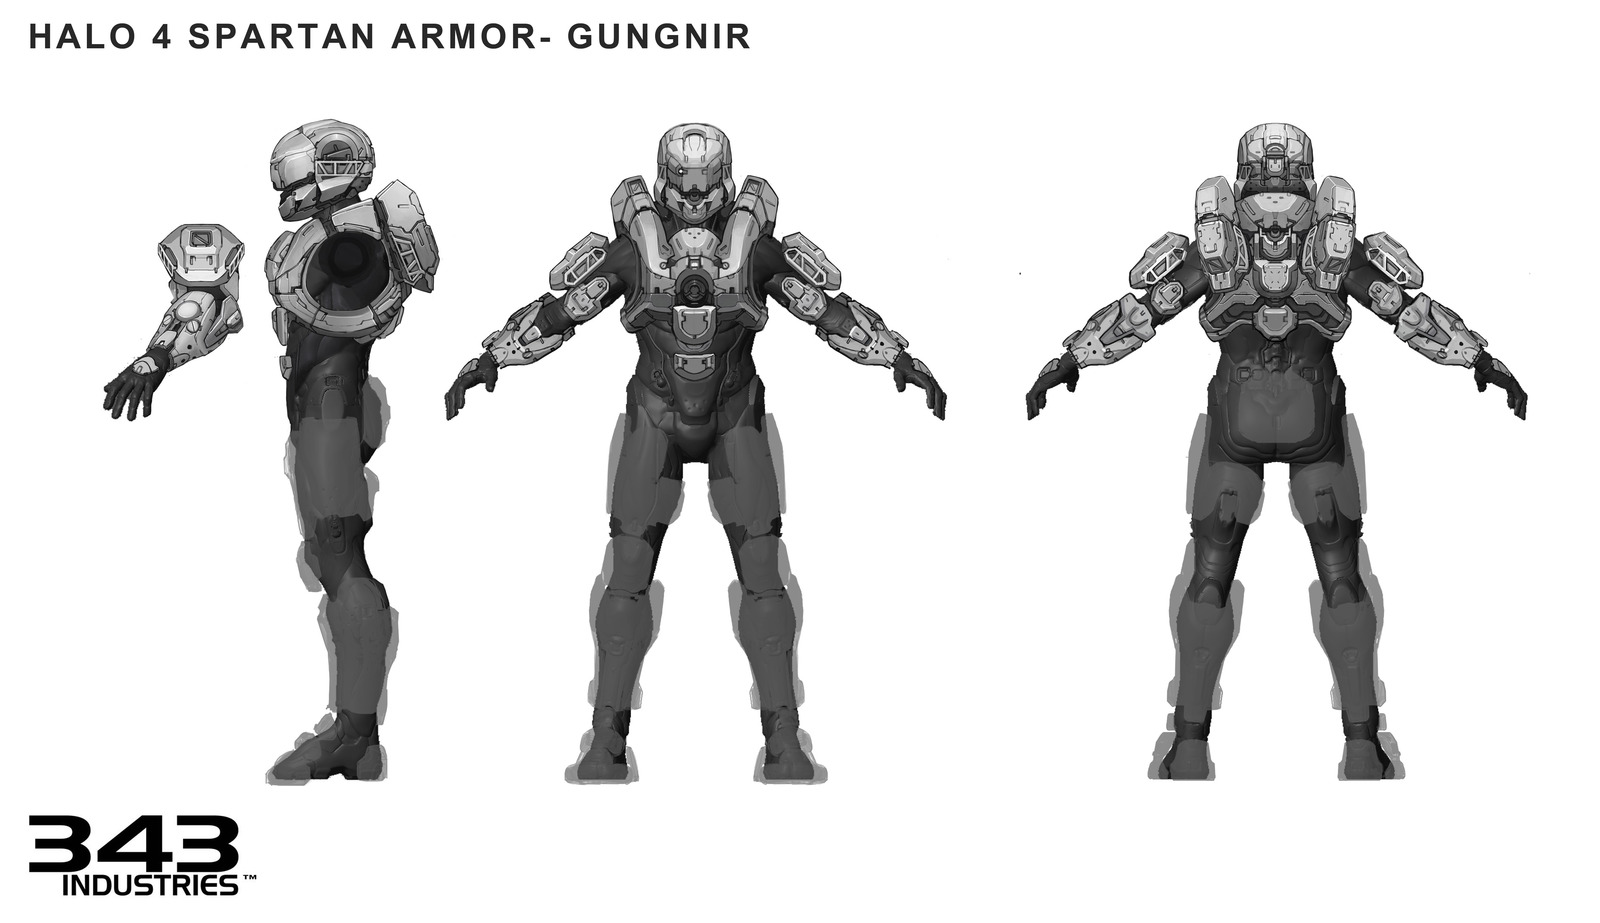 Halo 3 Unsc Marine Armor | Wiring Diagram Database